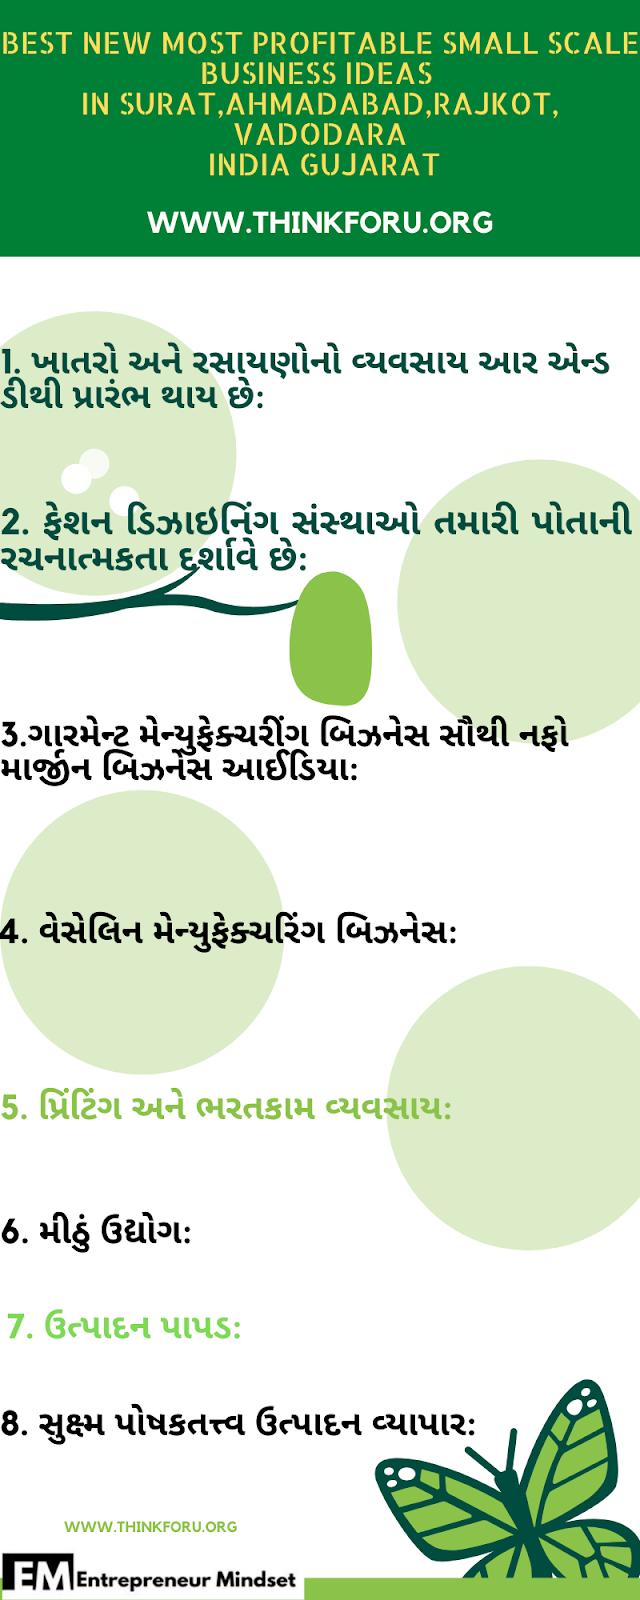 This is the info graphics of Gujarat business idea  સુરત, અહમદાબાદ, રાજકોટ, વડોદરા ઇન્ડિયા ગુજરાતના શ્રેષ્ઠ નવા સૌથી નફાકારક નાના પાયે બિઝનેસ આઈડિયા ગુજરાતી ભાષામાં  Best New most profitable Small scale business ideas in Surat,Ahmadabad,rajkot,vadodara india gujarat in Gujarati language